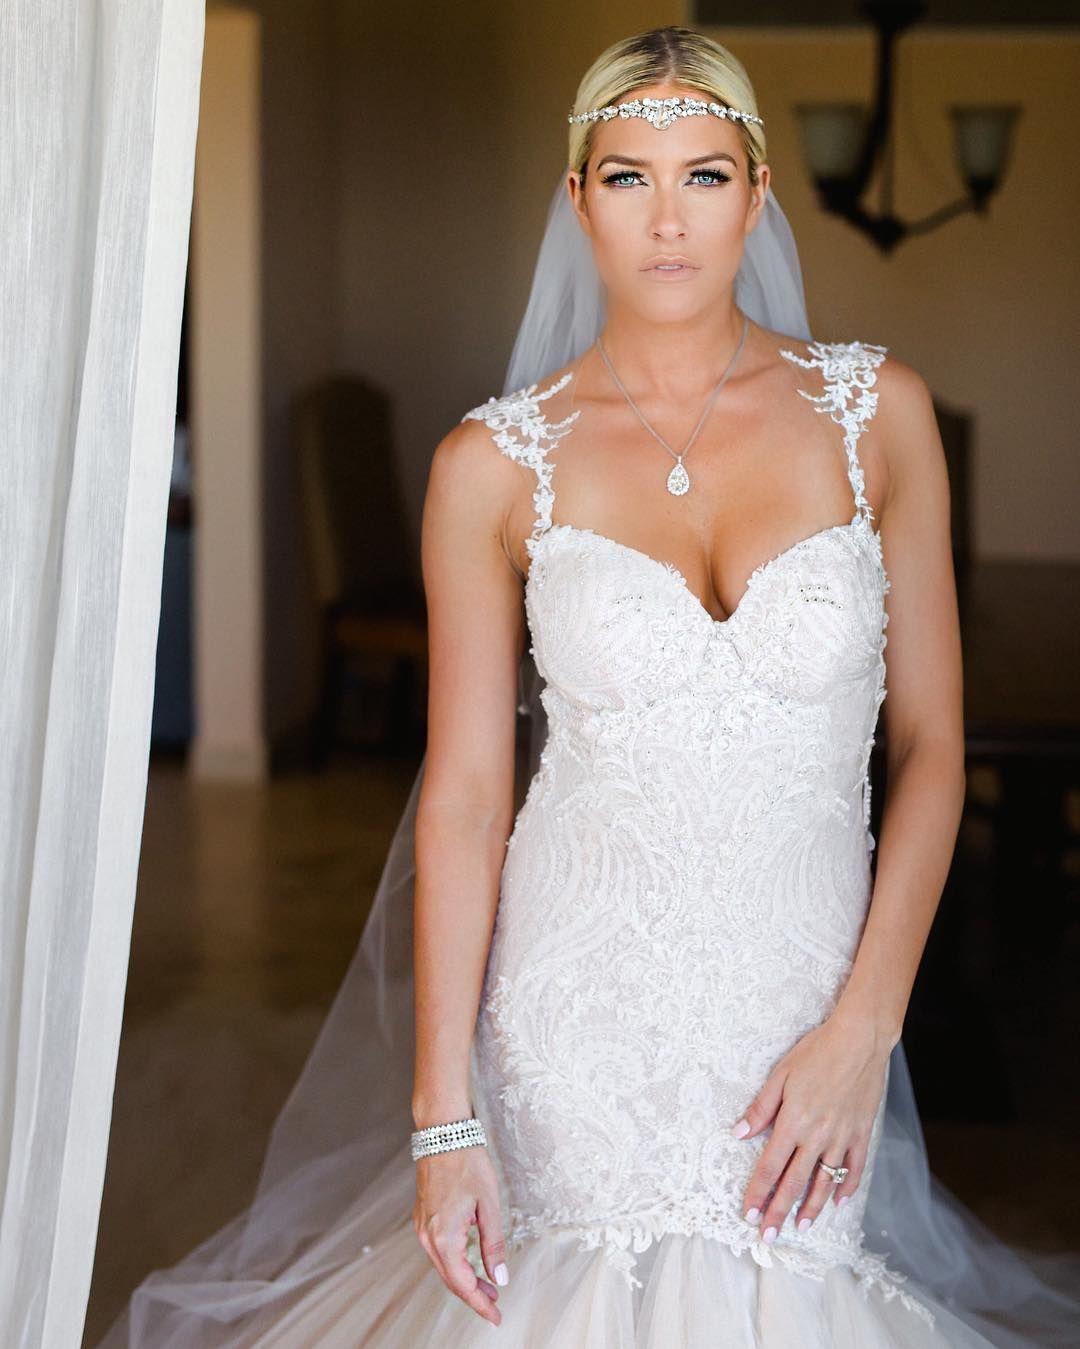 Wedding Diva: On Saturday, February 27, 2016, Barbie Blank (former WWE